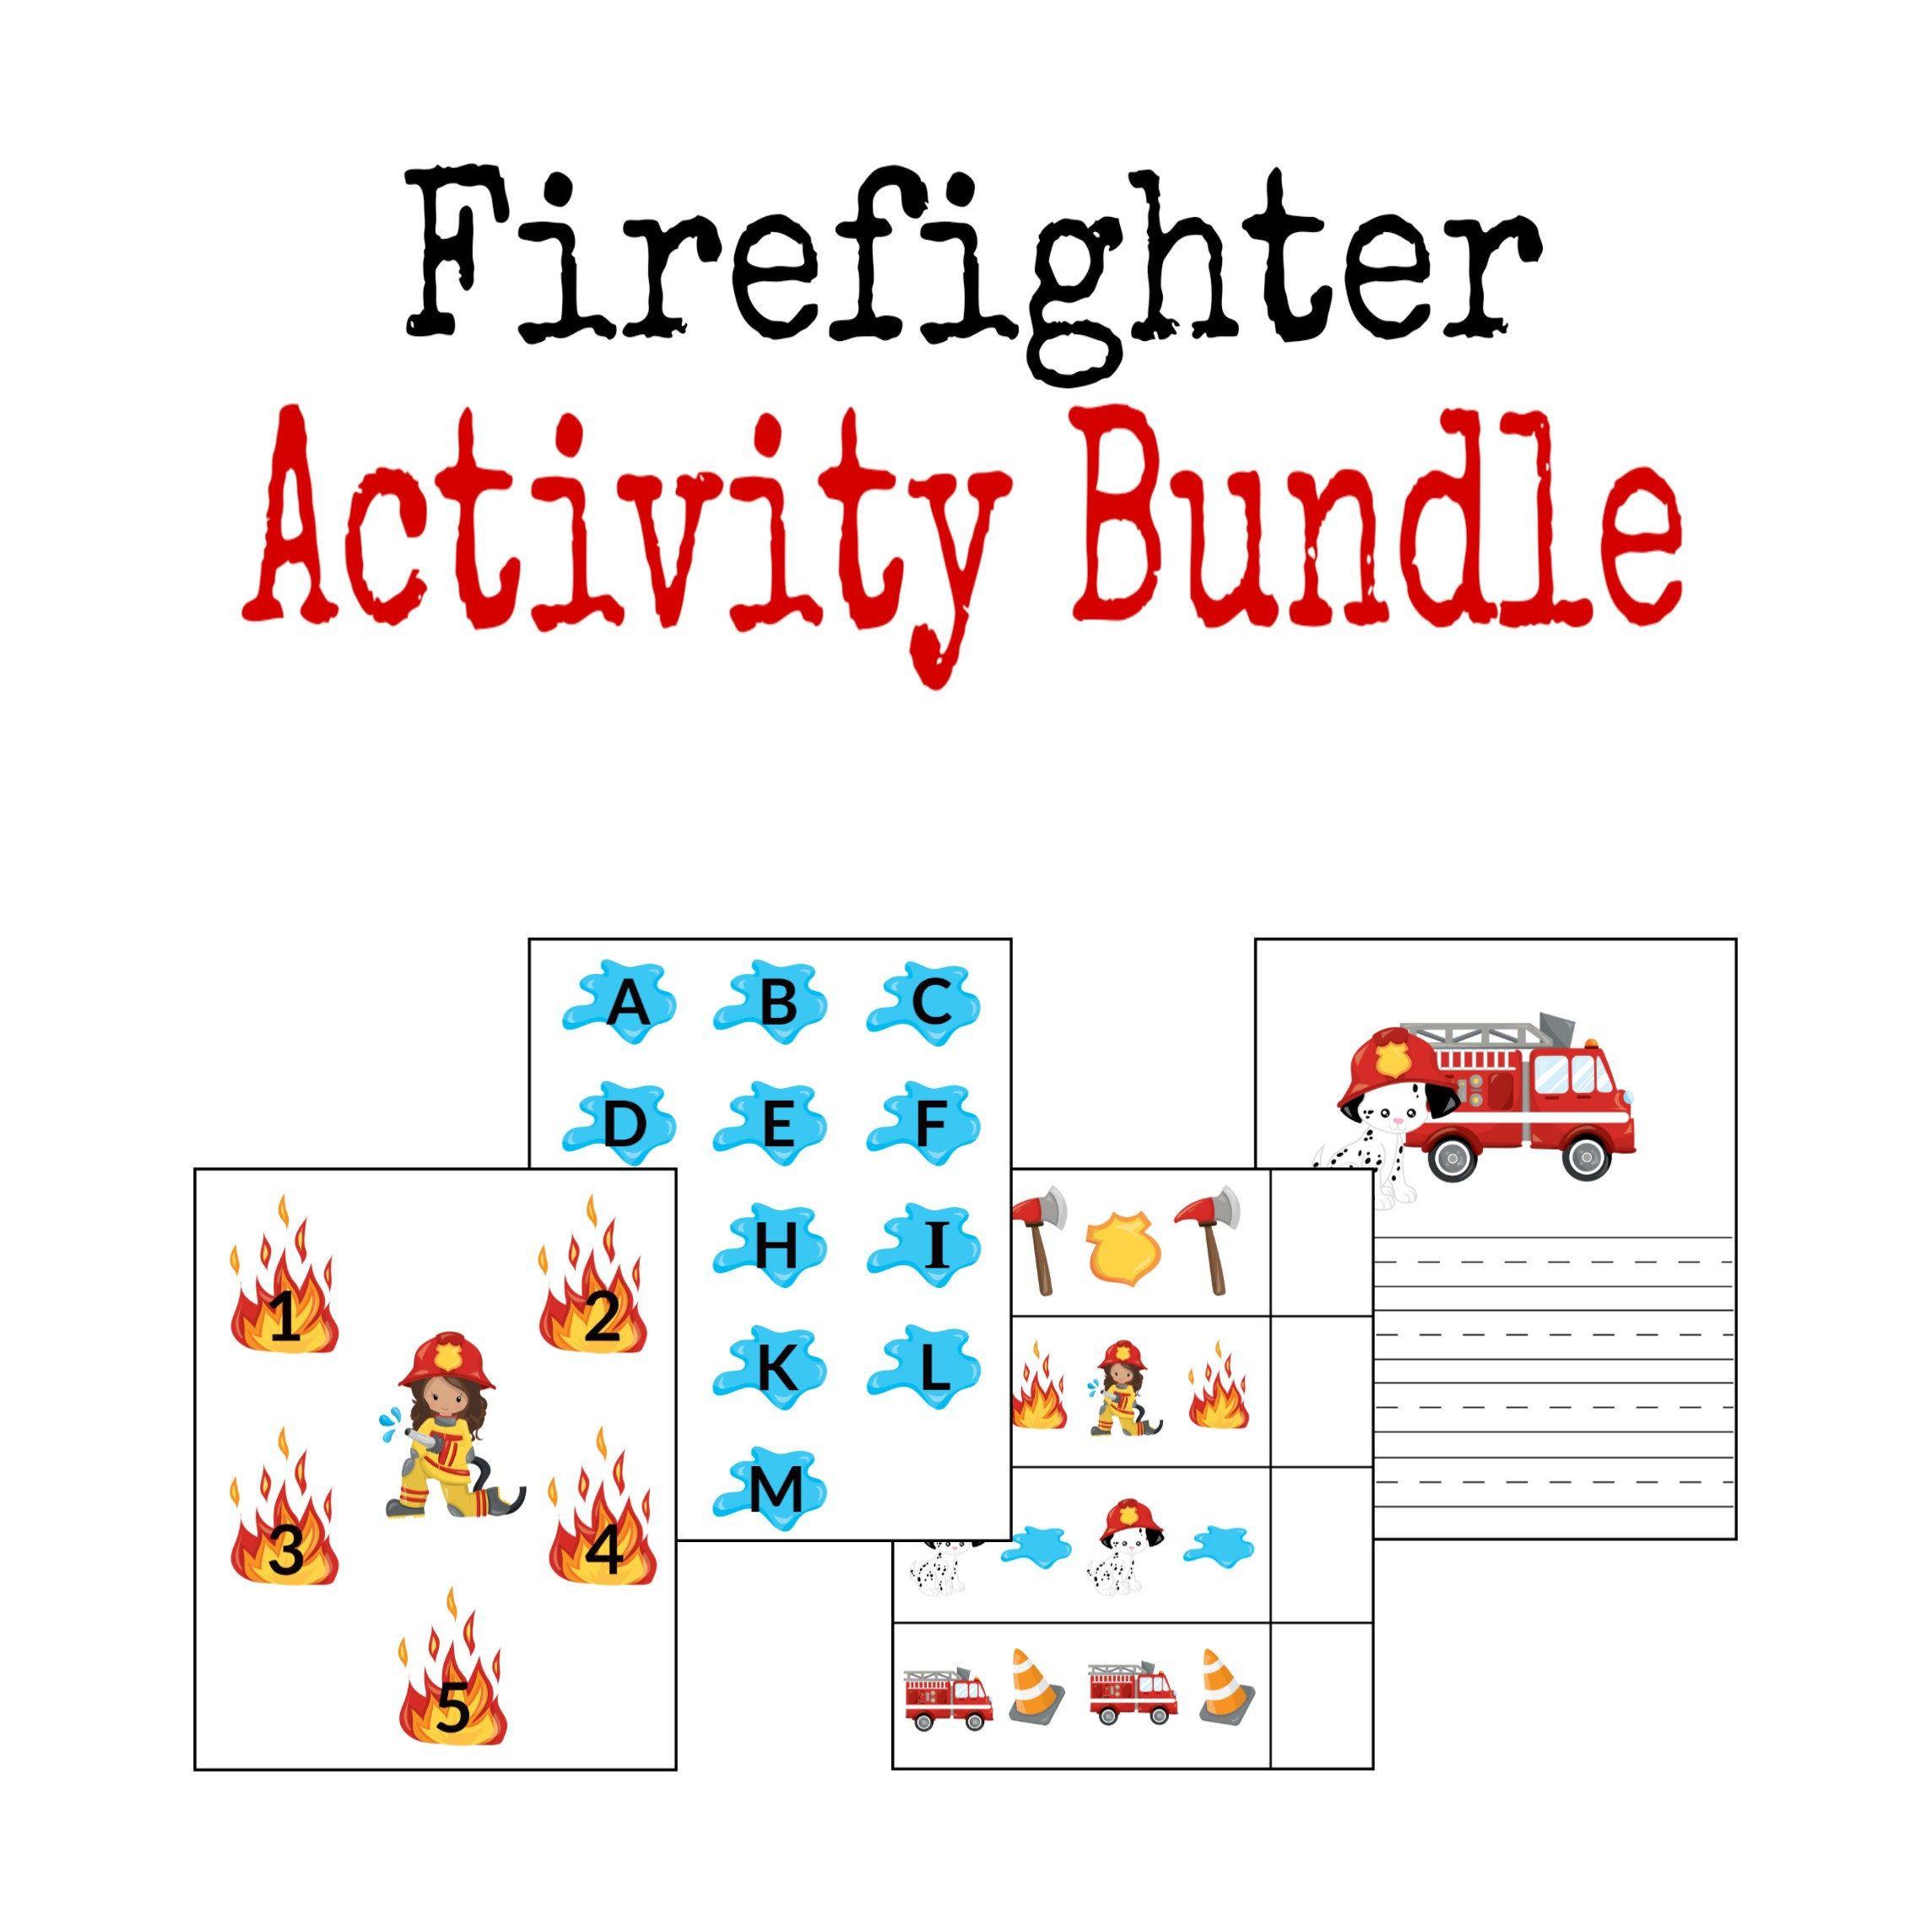 Firefighter File Folder Game Learning Activity Printable